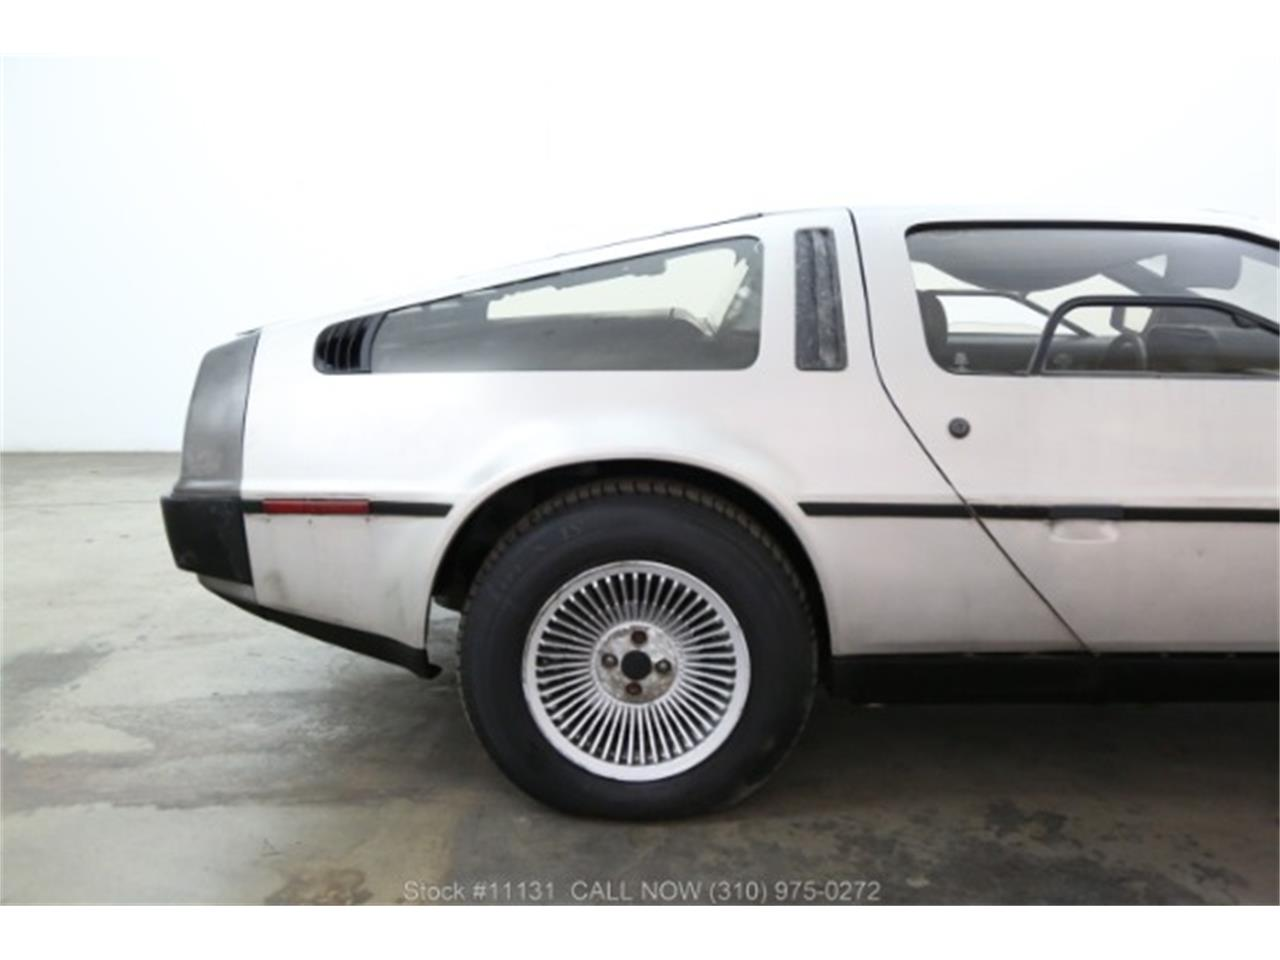 Large Picture of '81 DMC-12 - $19,500.00 - QNPP